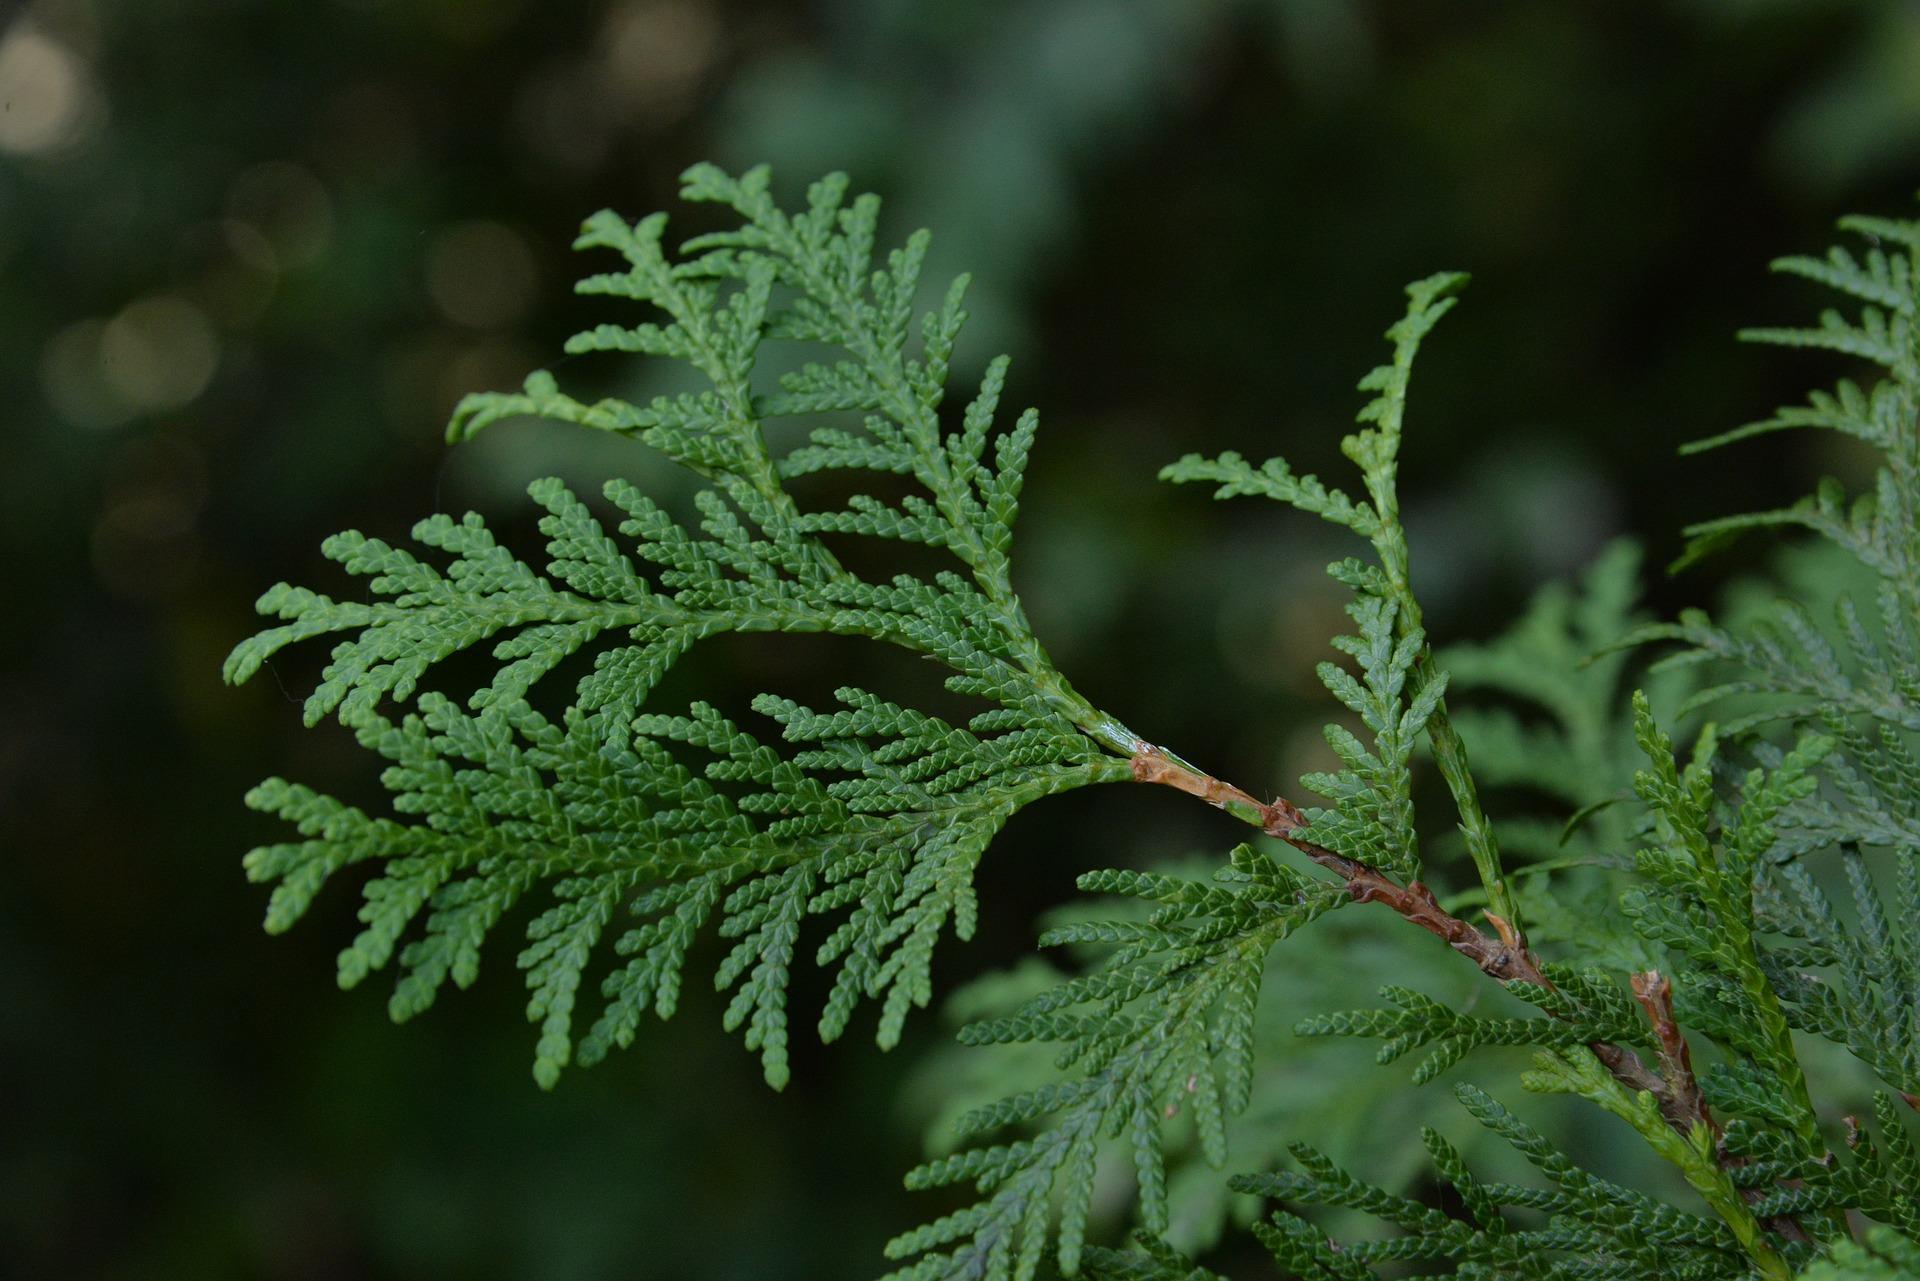 Helårsgrønn sånn som tujaen, ja, den evig-aktuelle tujaen…